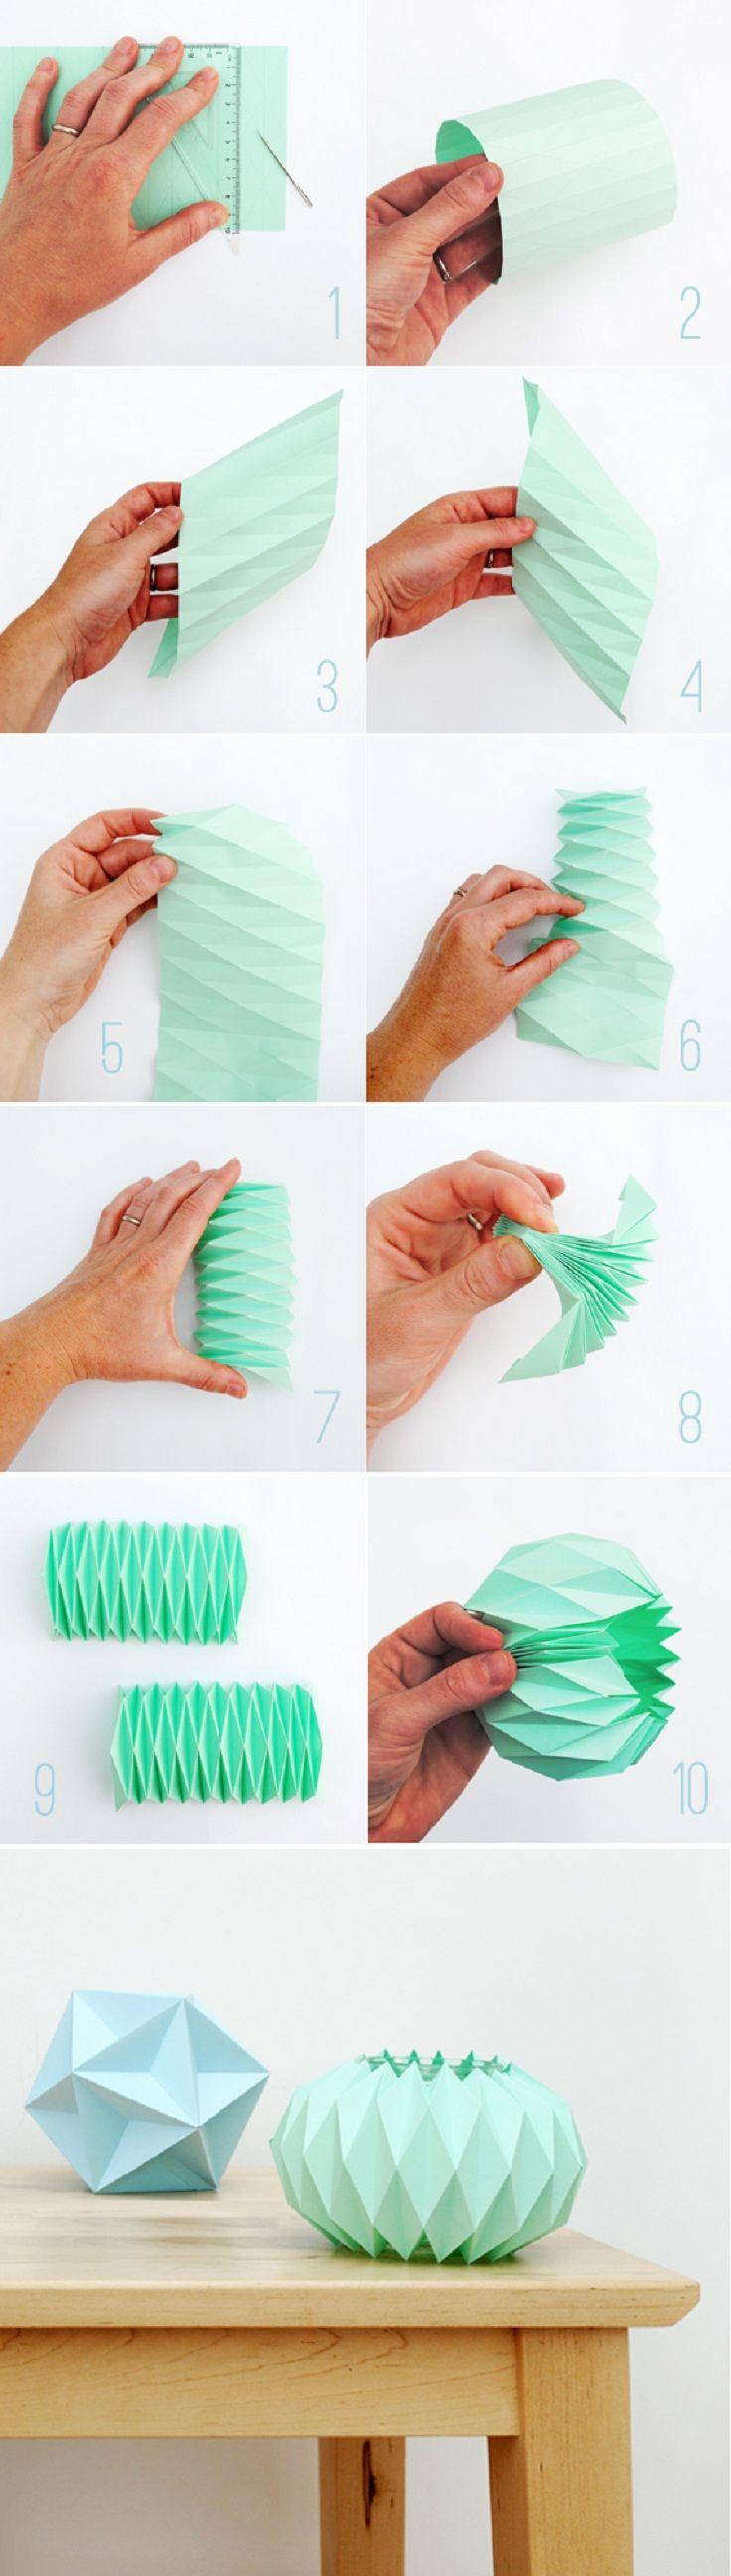 Idée pour des bougeoirs + inspi lampe origami